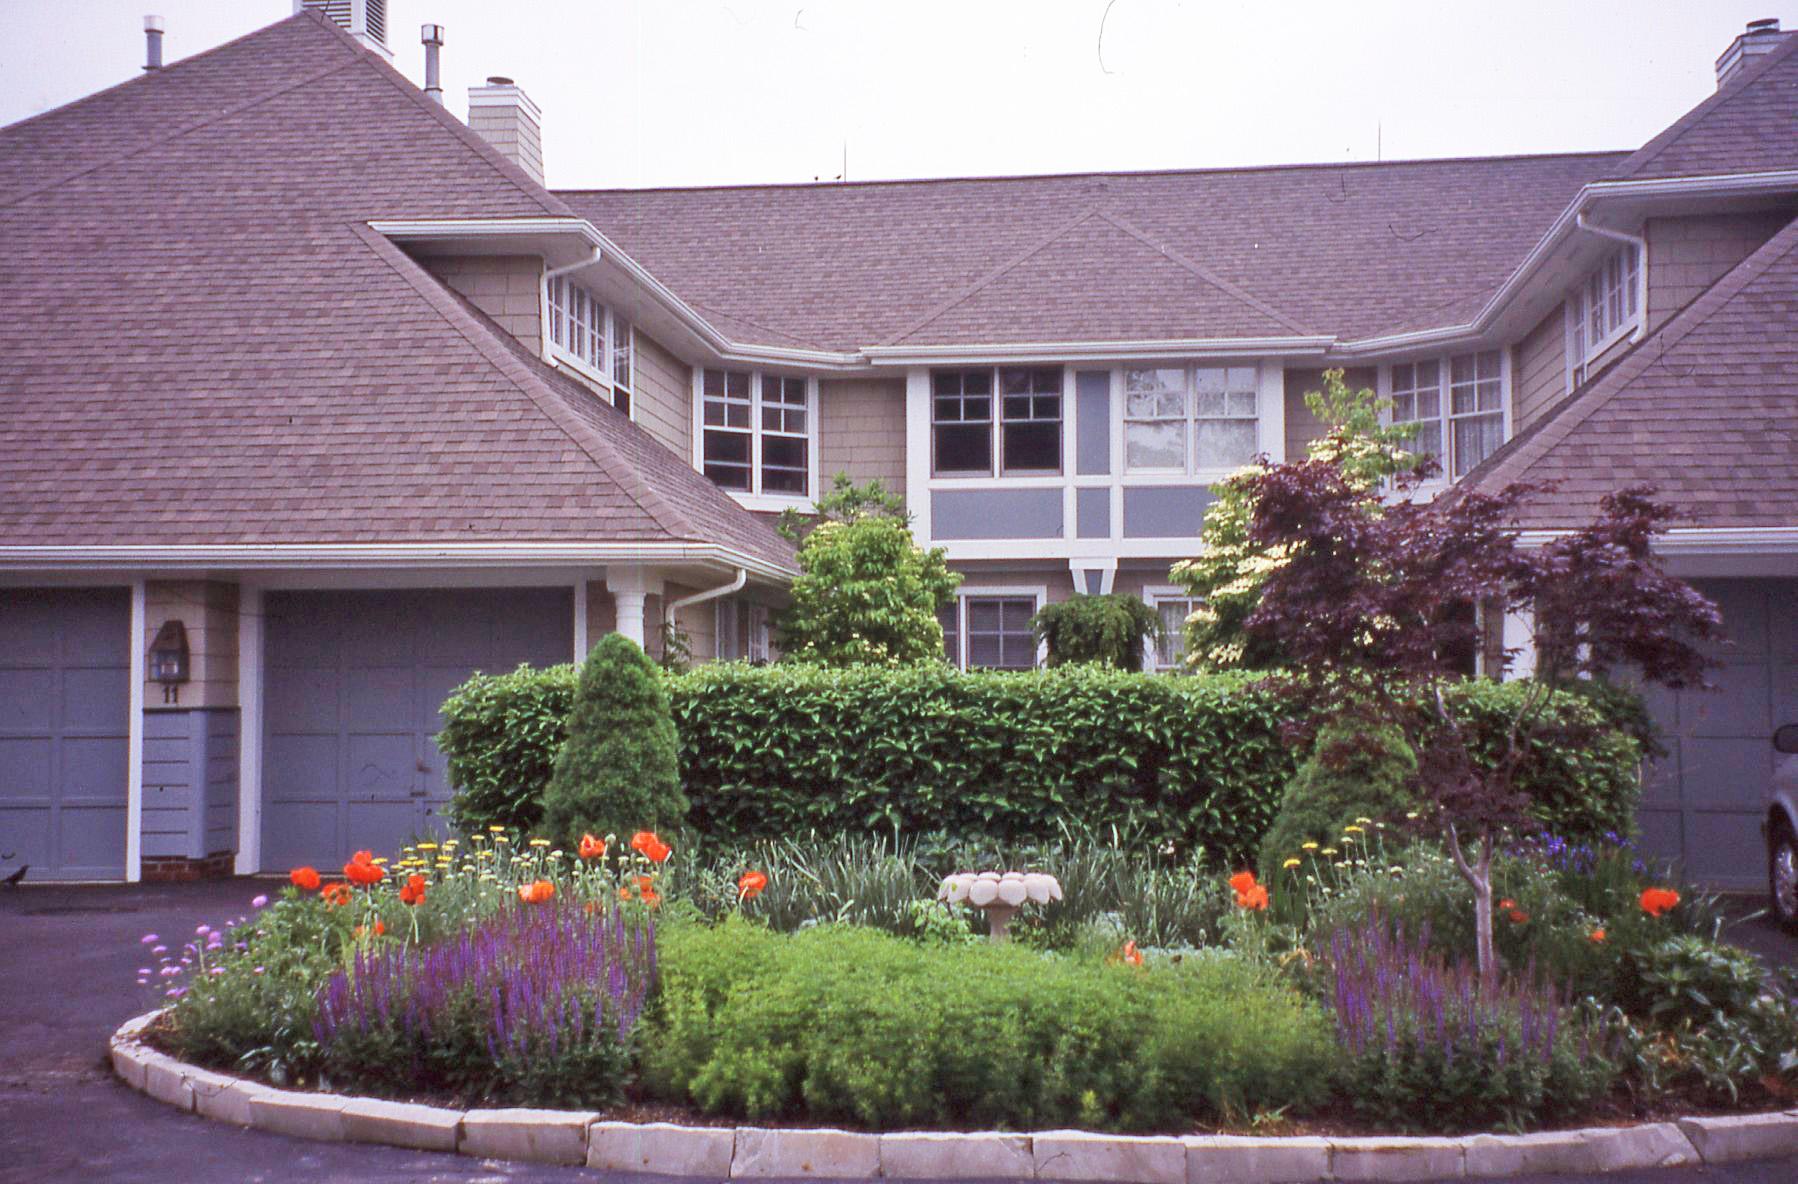 Landscape renovation and maintenance bobbie 39 s green thumb for Landscape renovations